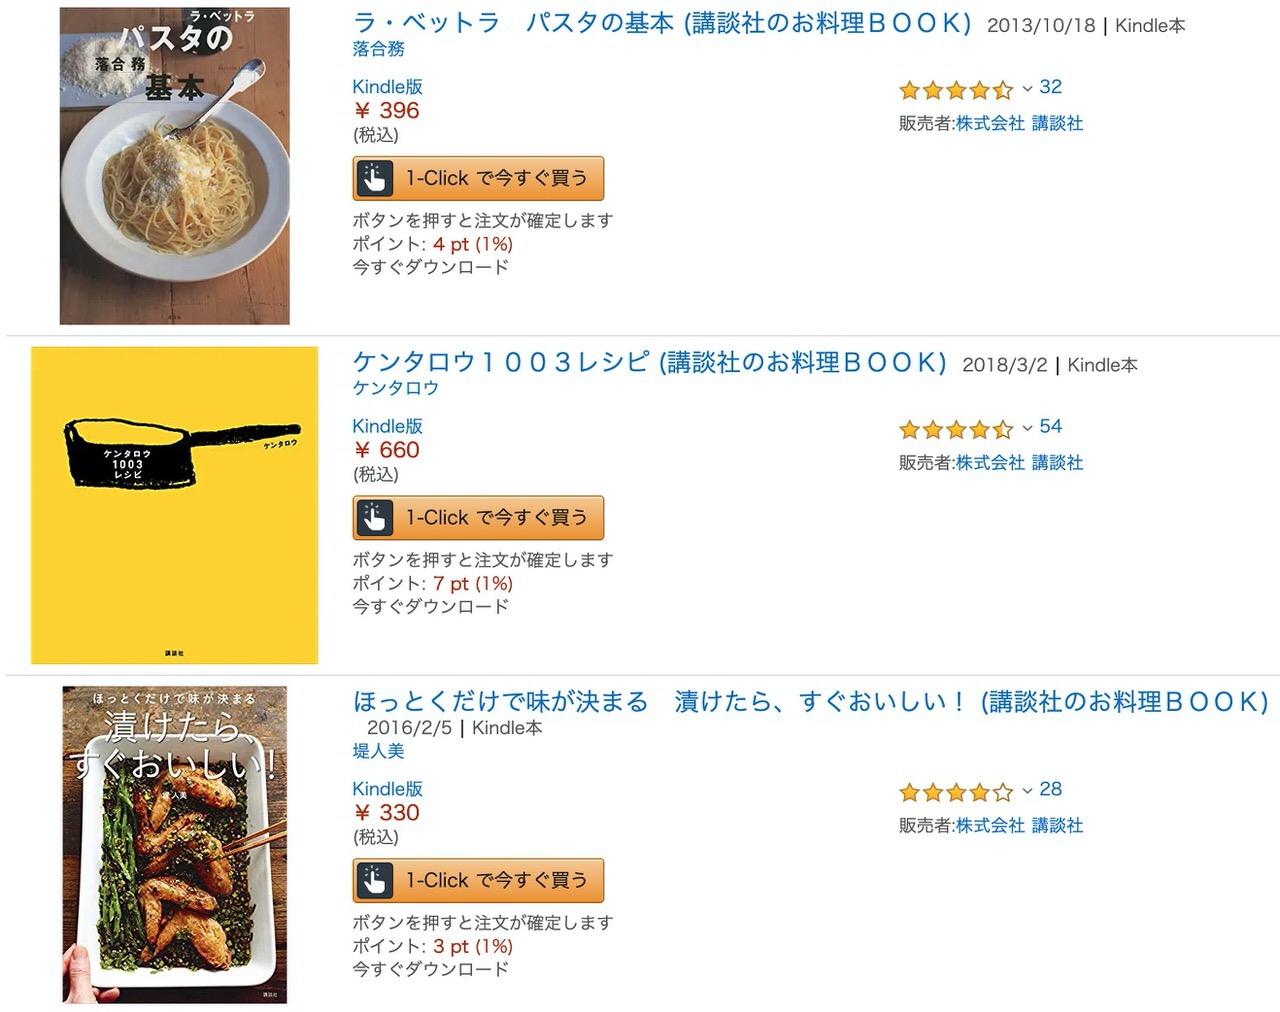 【Kindleセール】パスタ・つまみ・いえ中華・麺など176冊が対象の「春のレシピ本祭り」(4/30まで)